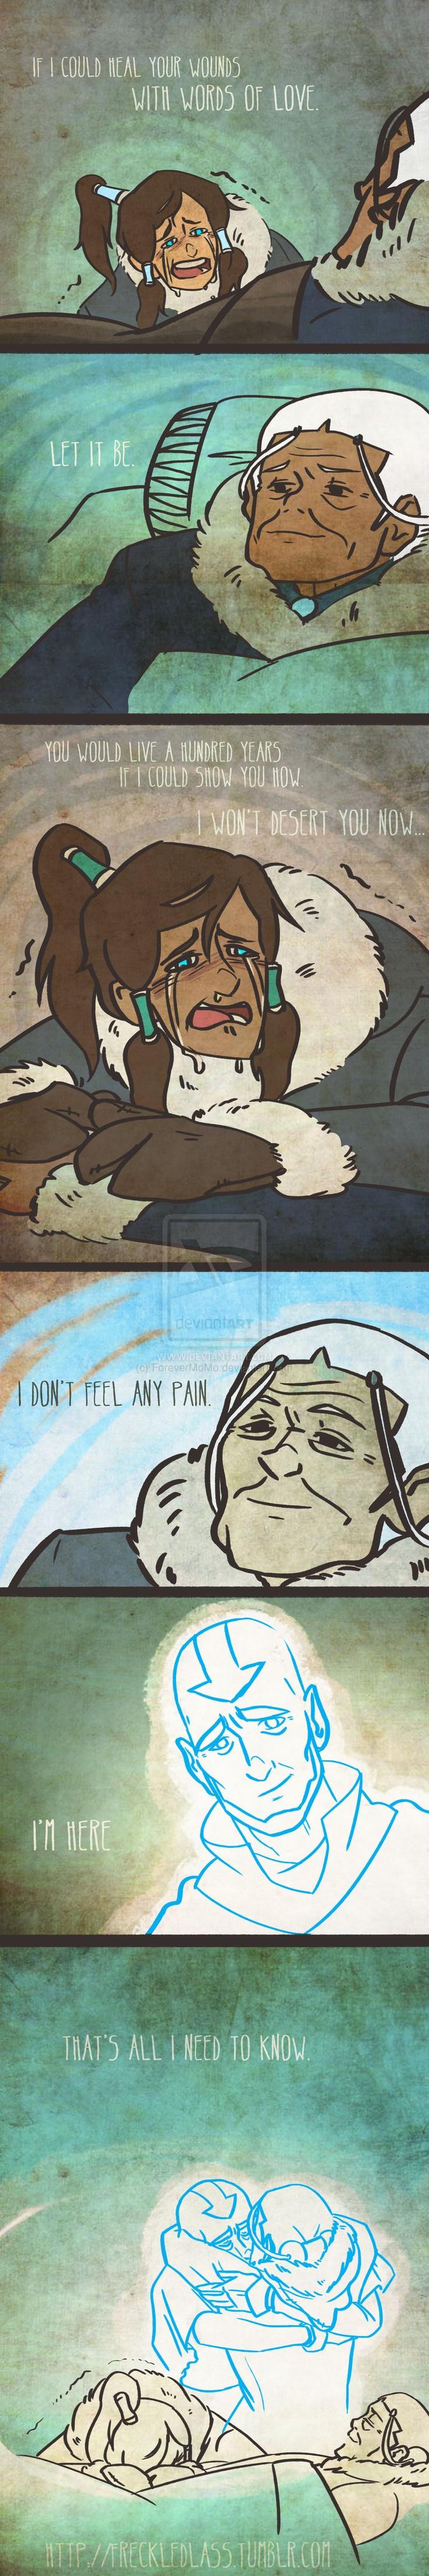 Avatar the last airbender love *sobs*